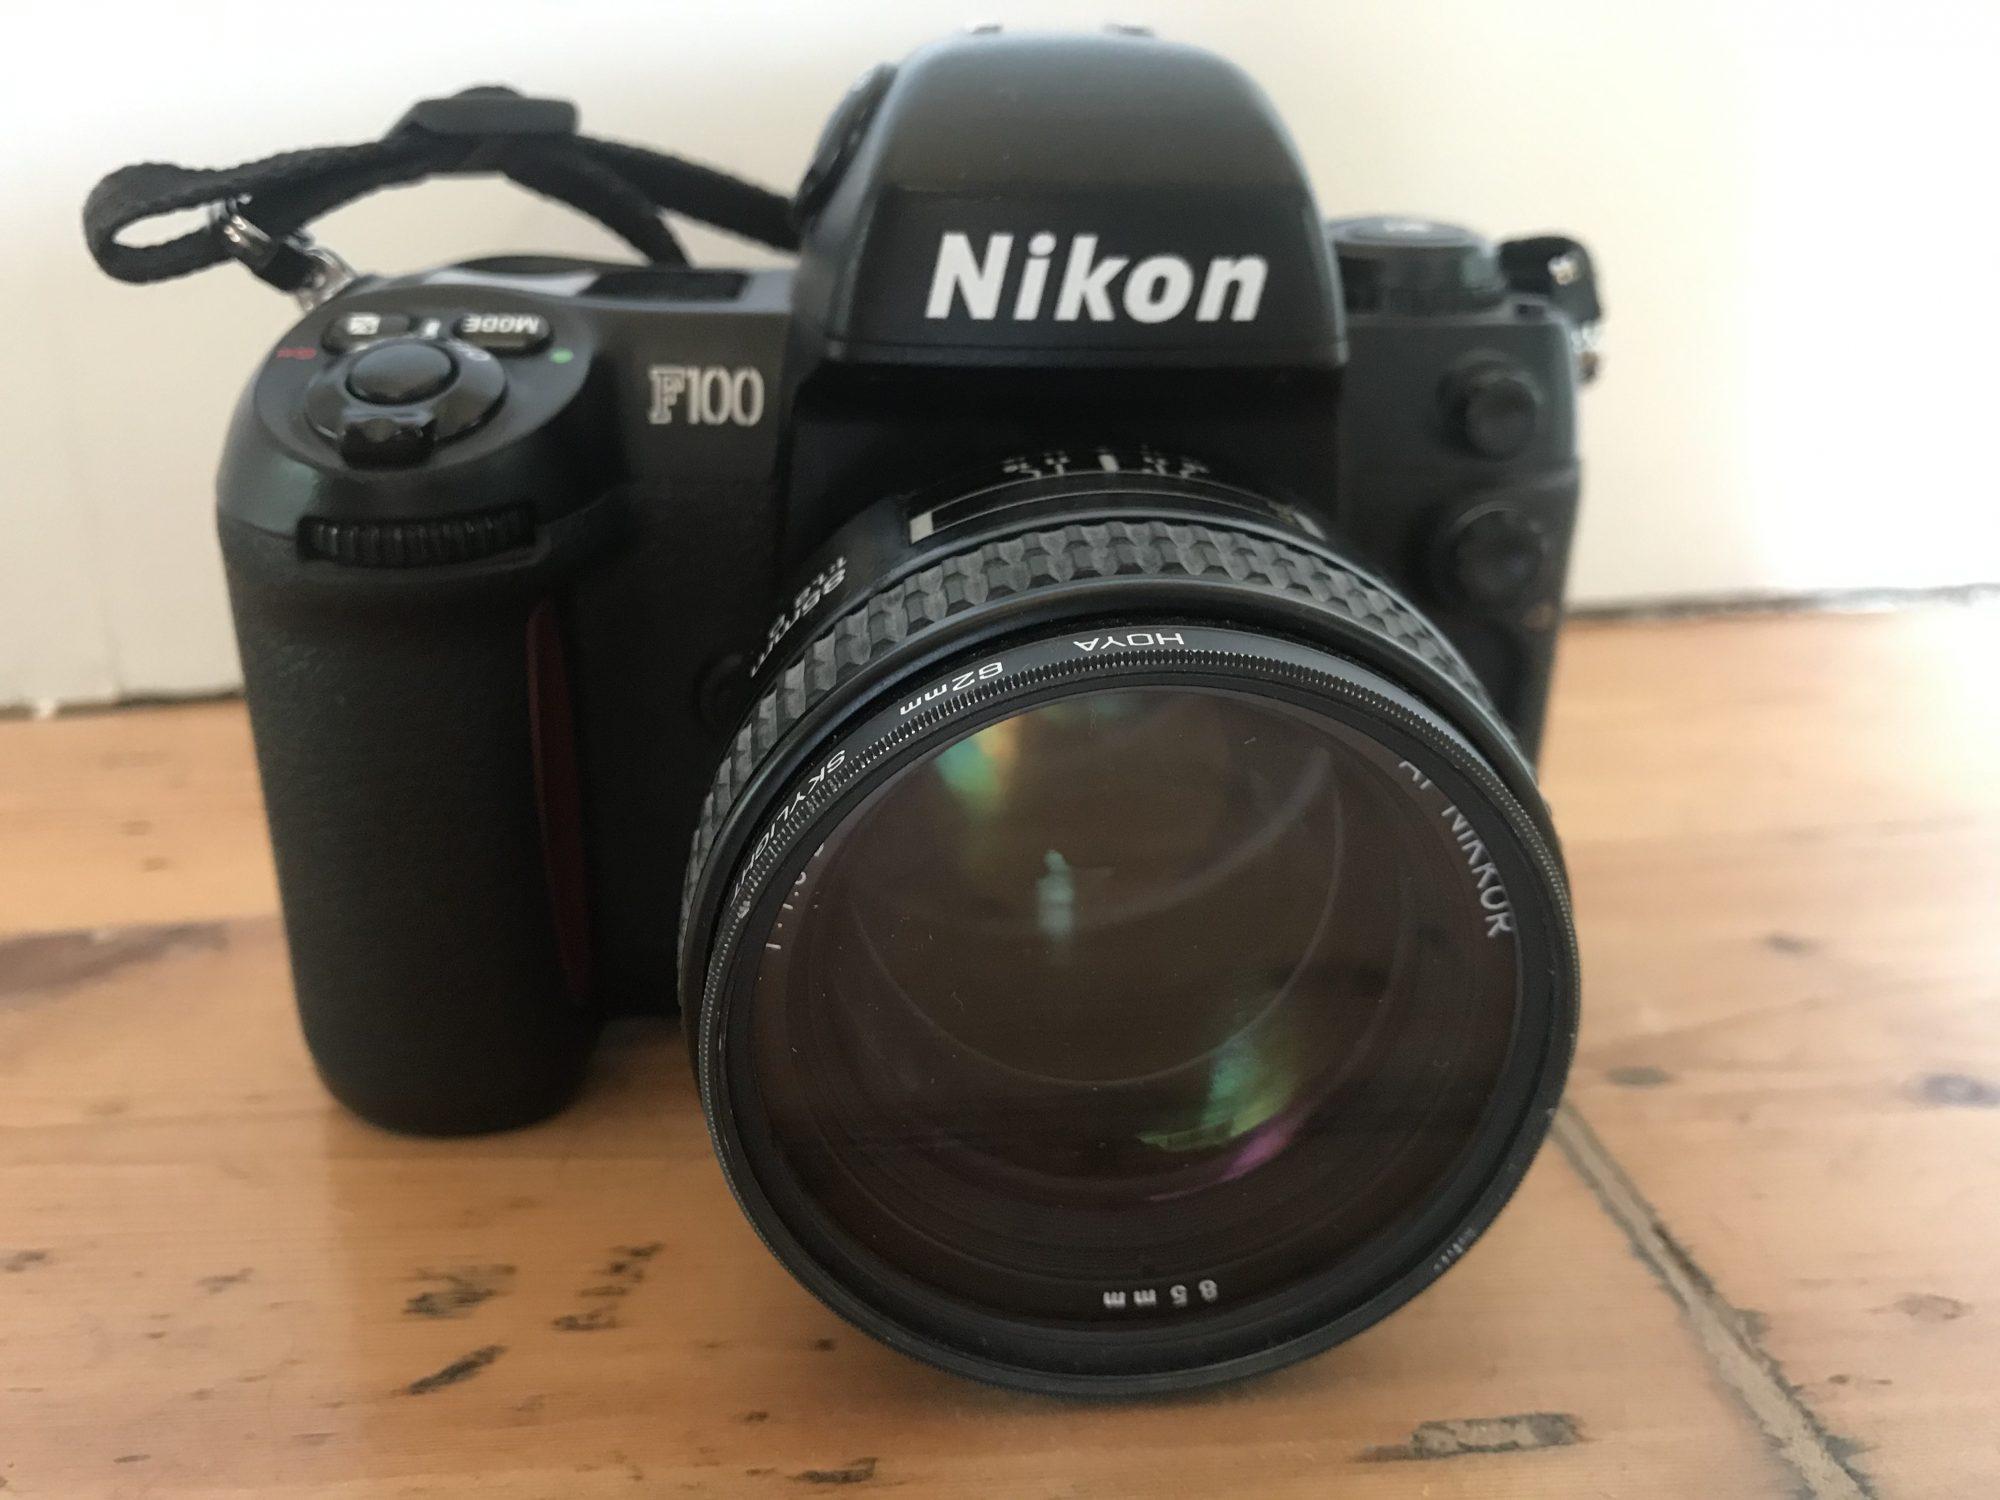 Nikon F100 (Pic: Stephen Dowling)